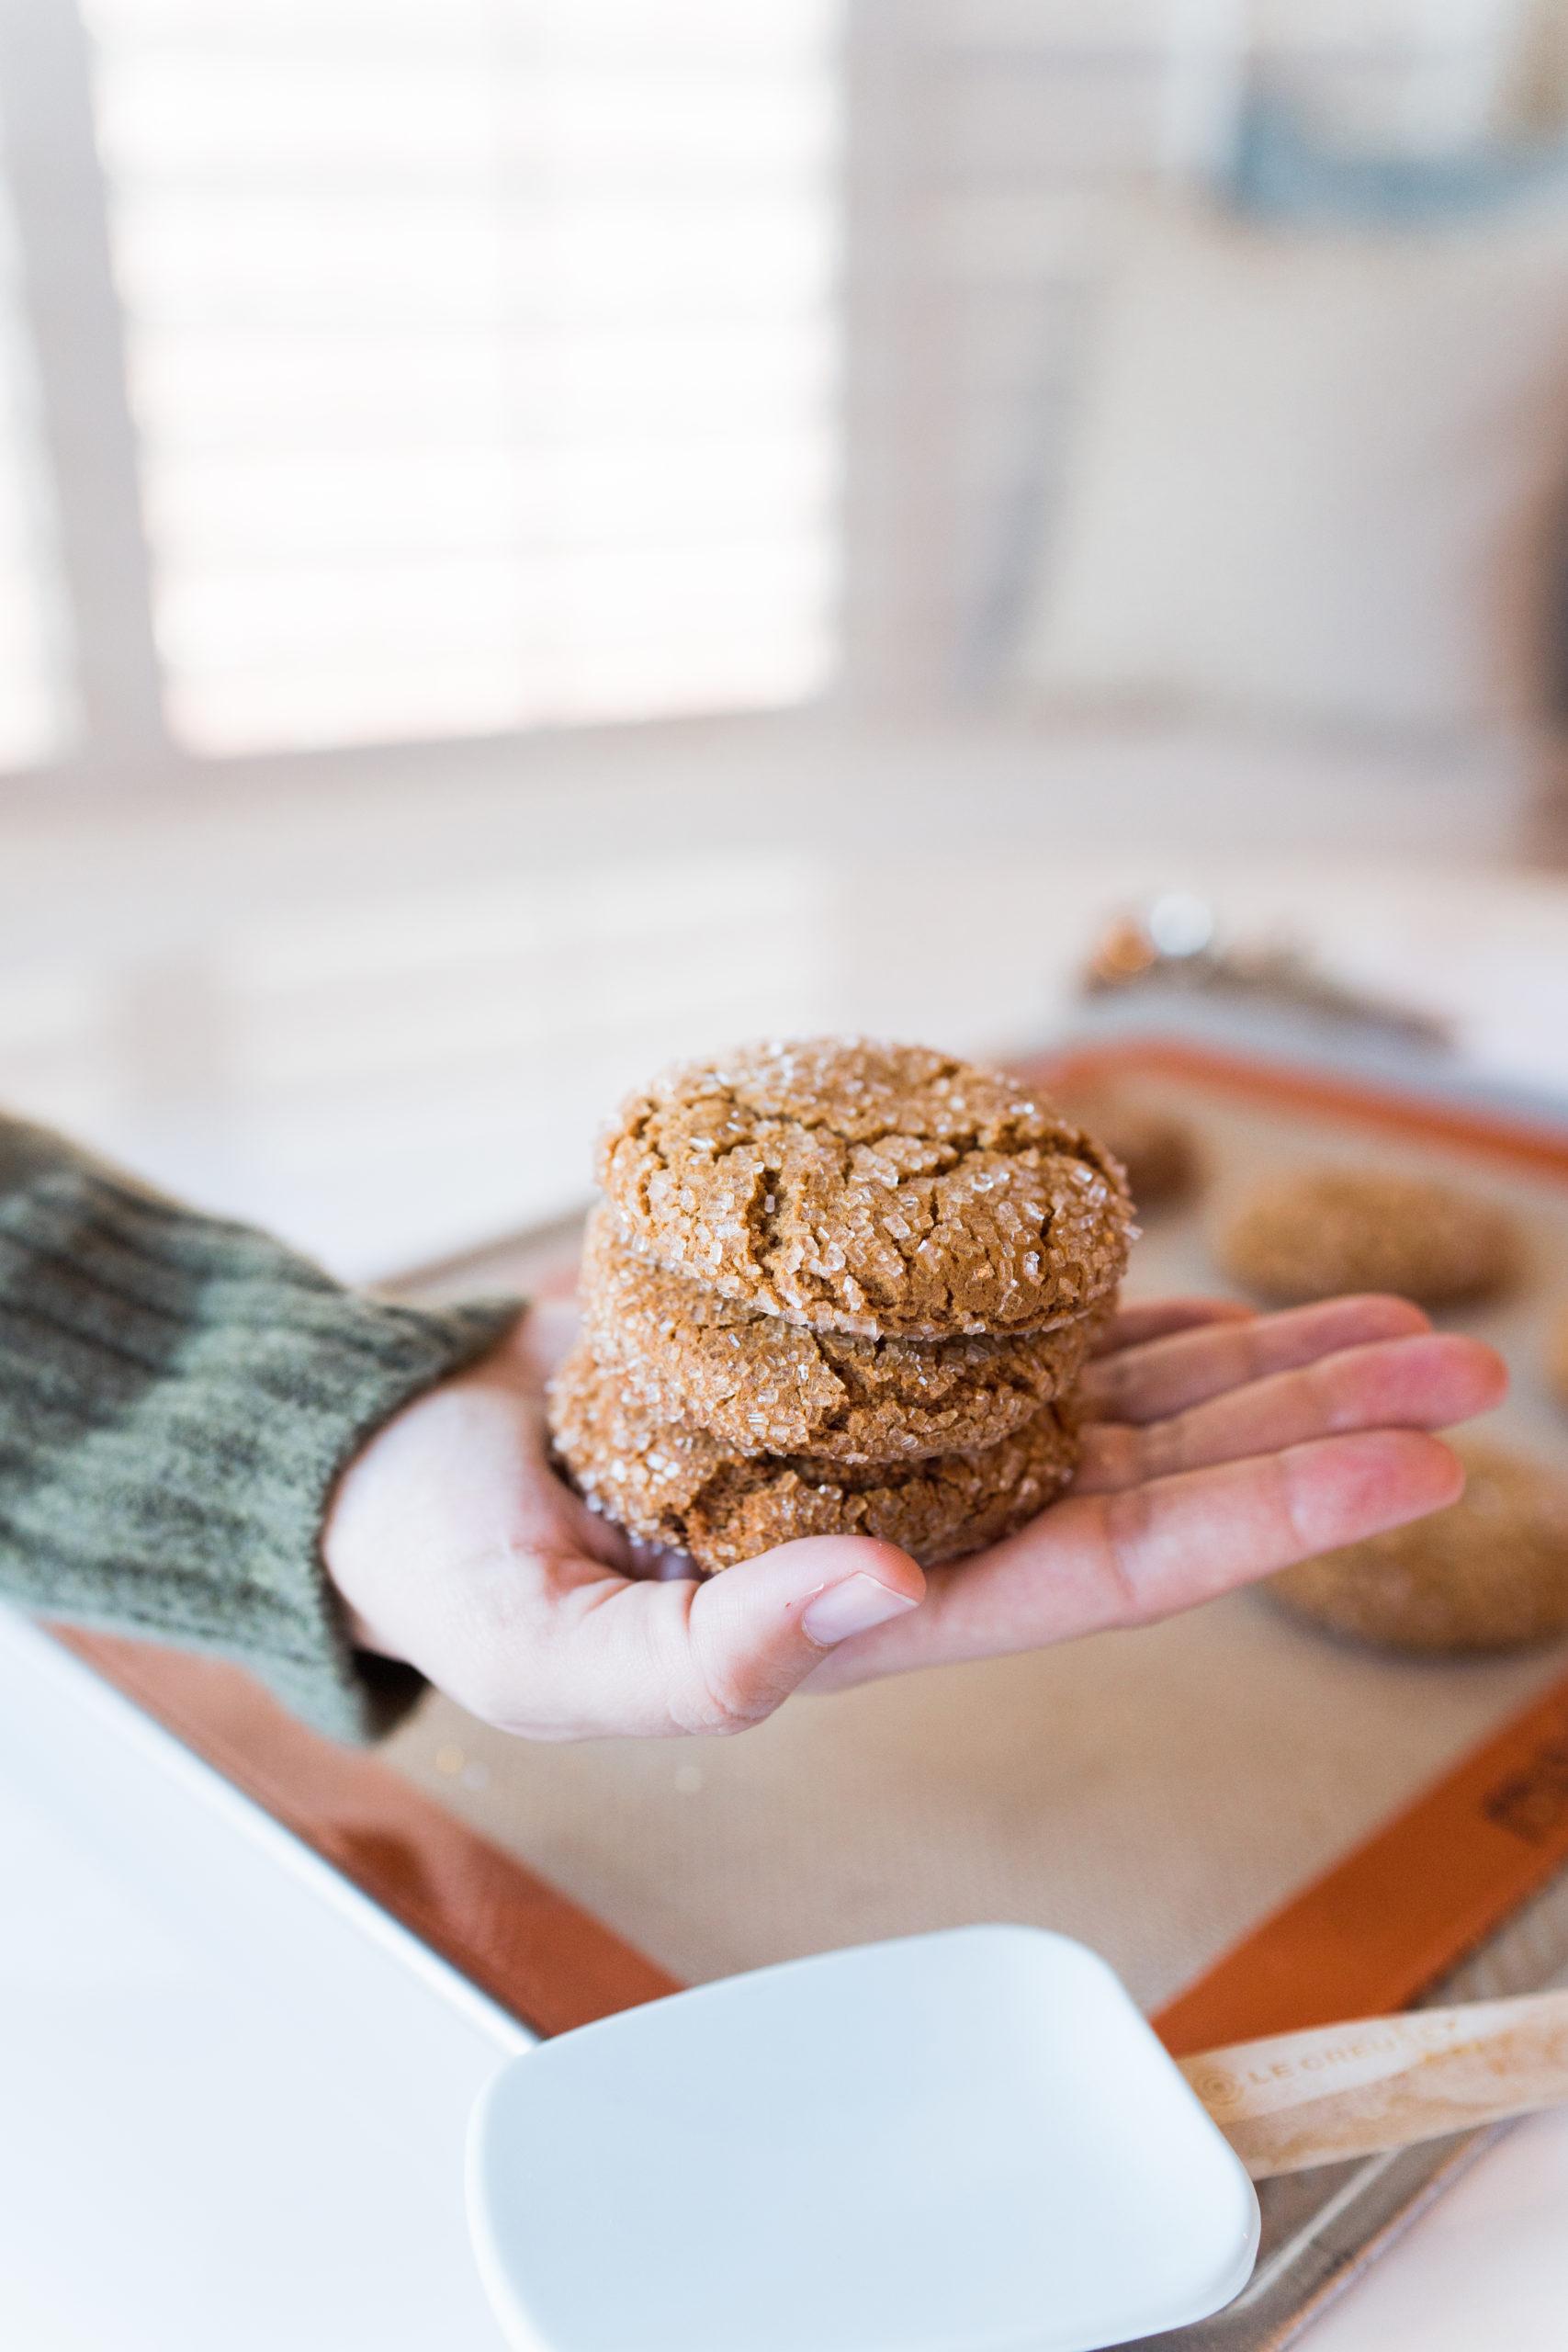 Homemade ginger molasses cookies